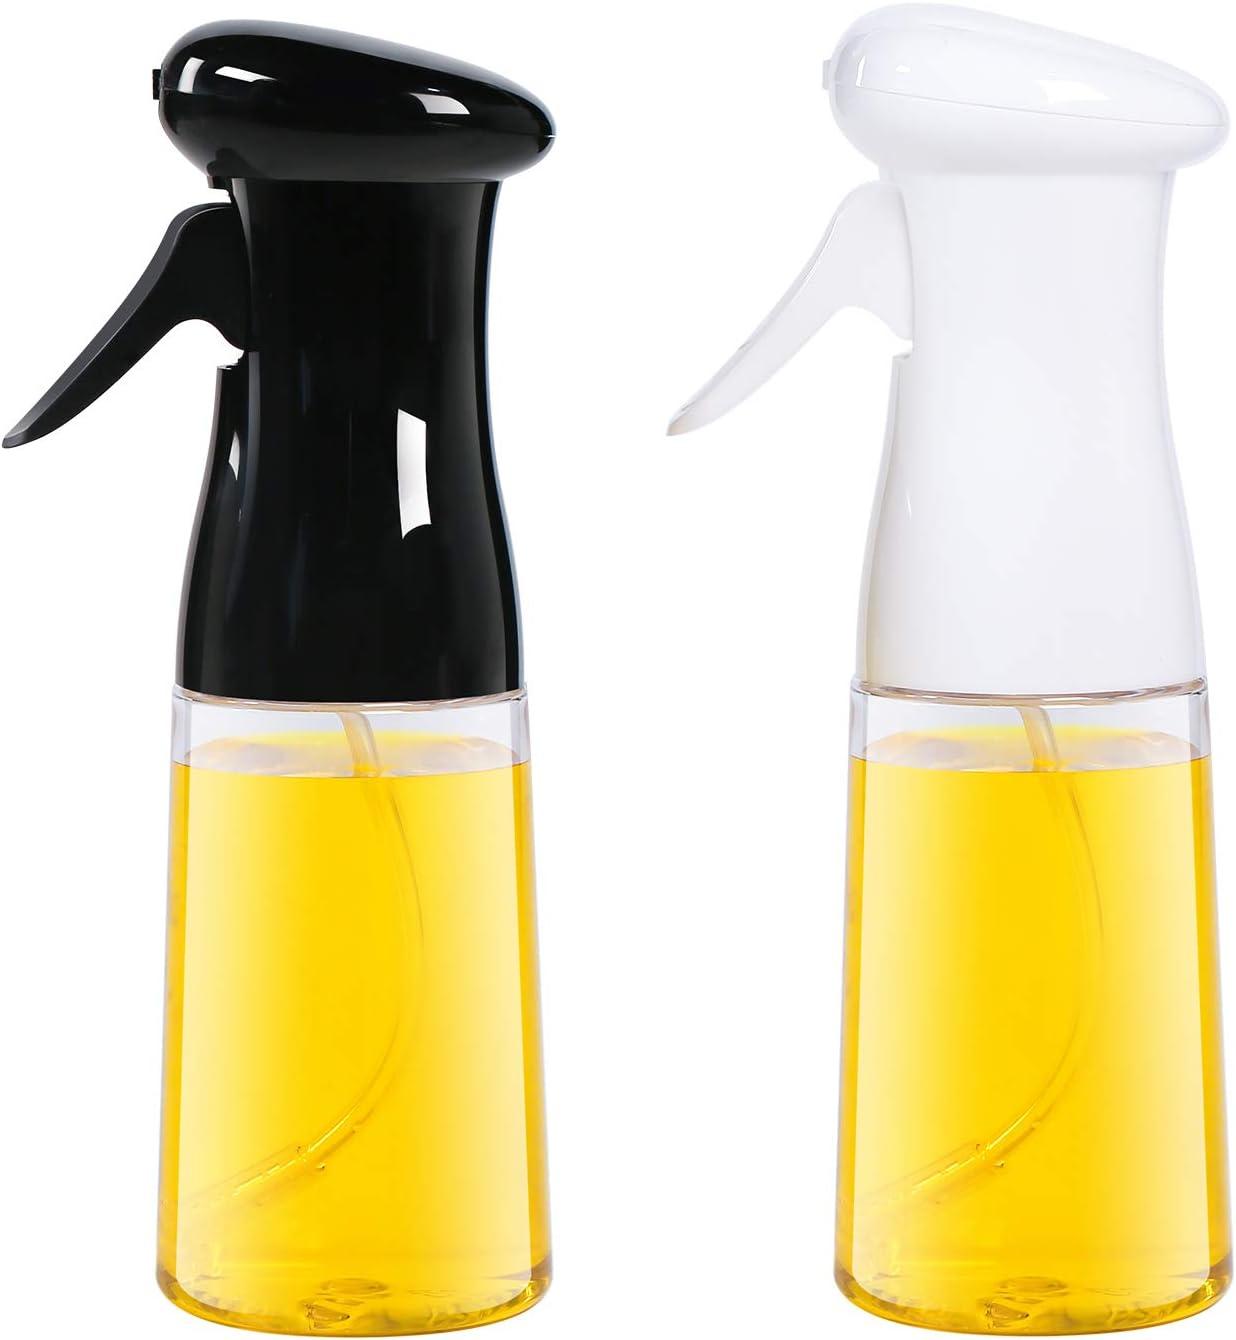 AMINNO Oil Sprayer for Cooking 2 Pack, Oil Sprayer Mister for Air Fryer, Versatile Oil Spray Bottle for Grilling Roasting Baking Salad BBQ, Food Grade BPA free, Ergonomically Designed 7oz/200ml